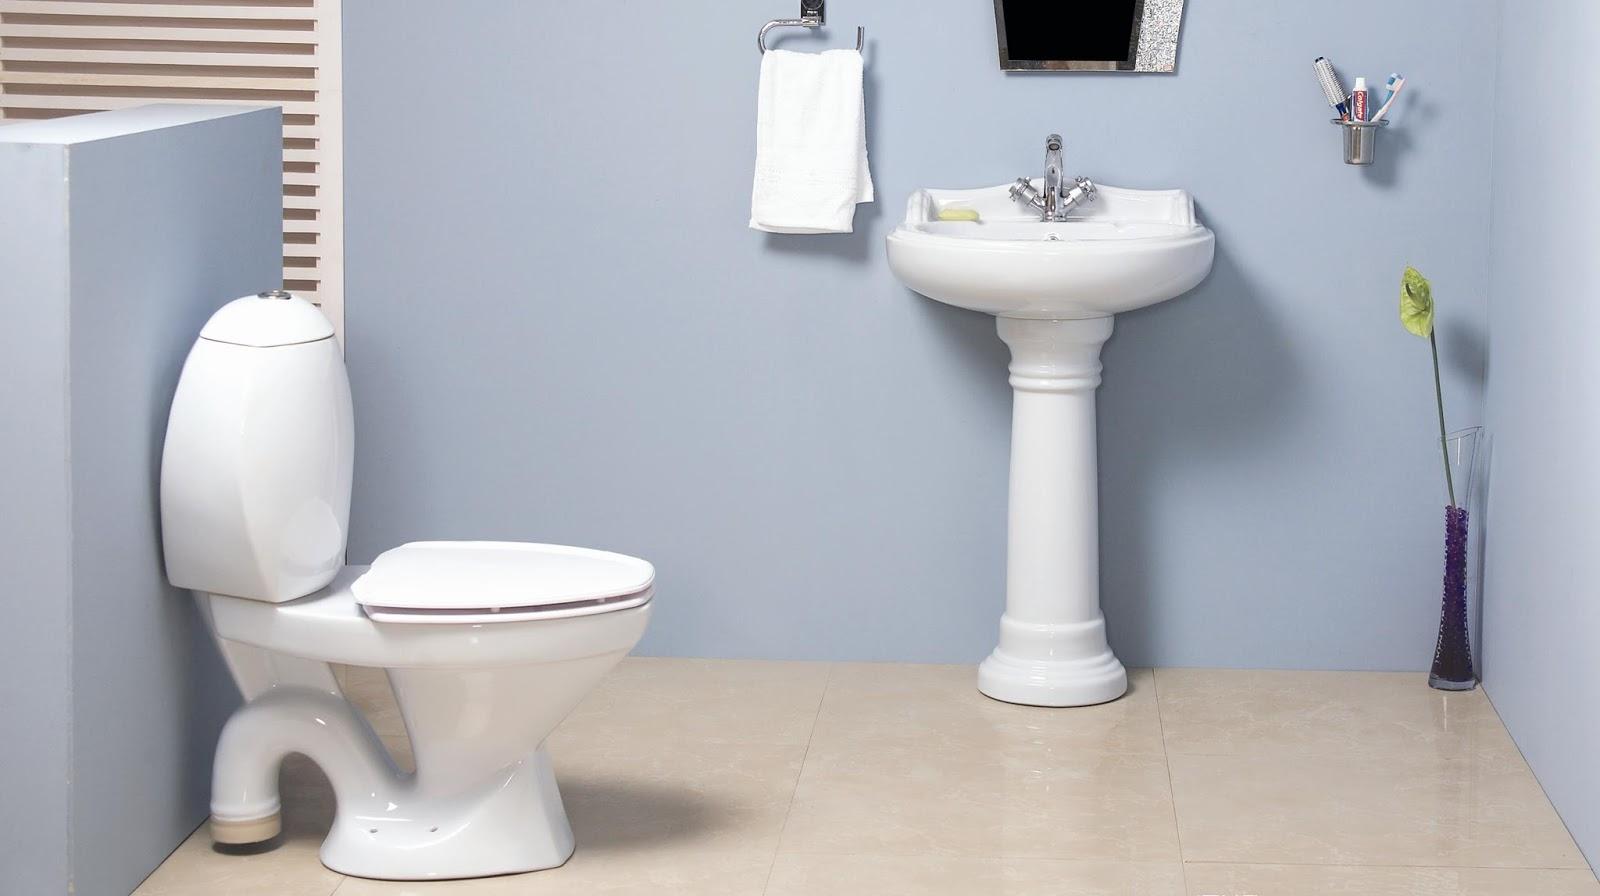 Luxury Bathroom Tile Companies Inspiration - Bathtub Ideas - dilata.info